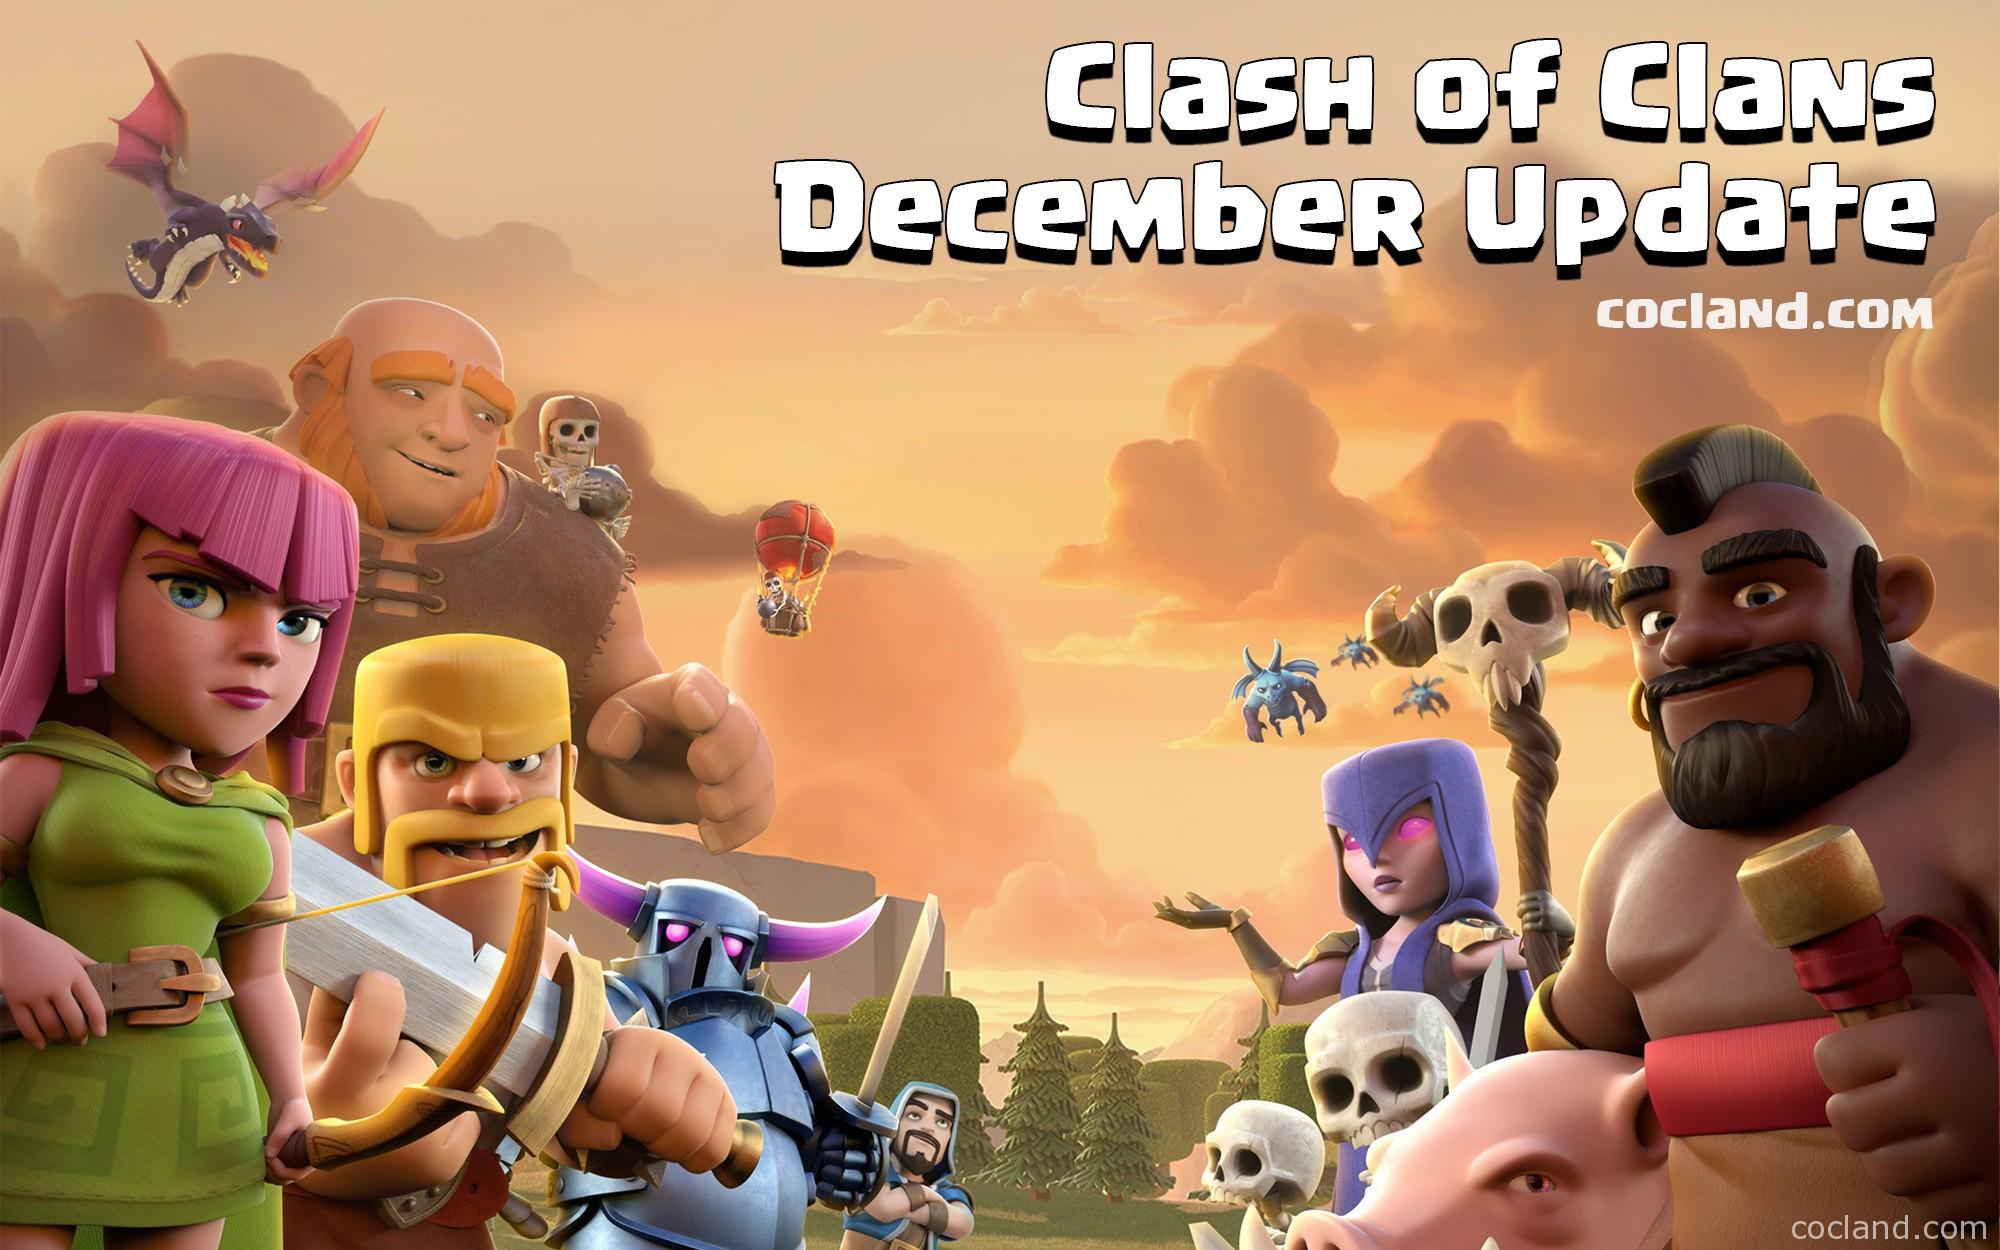 Clash of Clans December Update